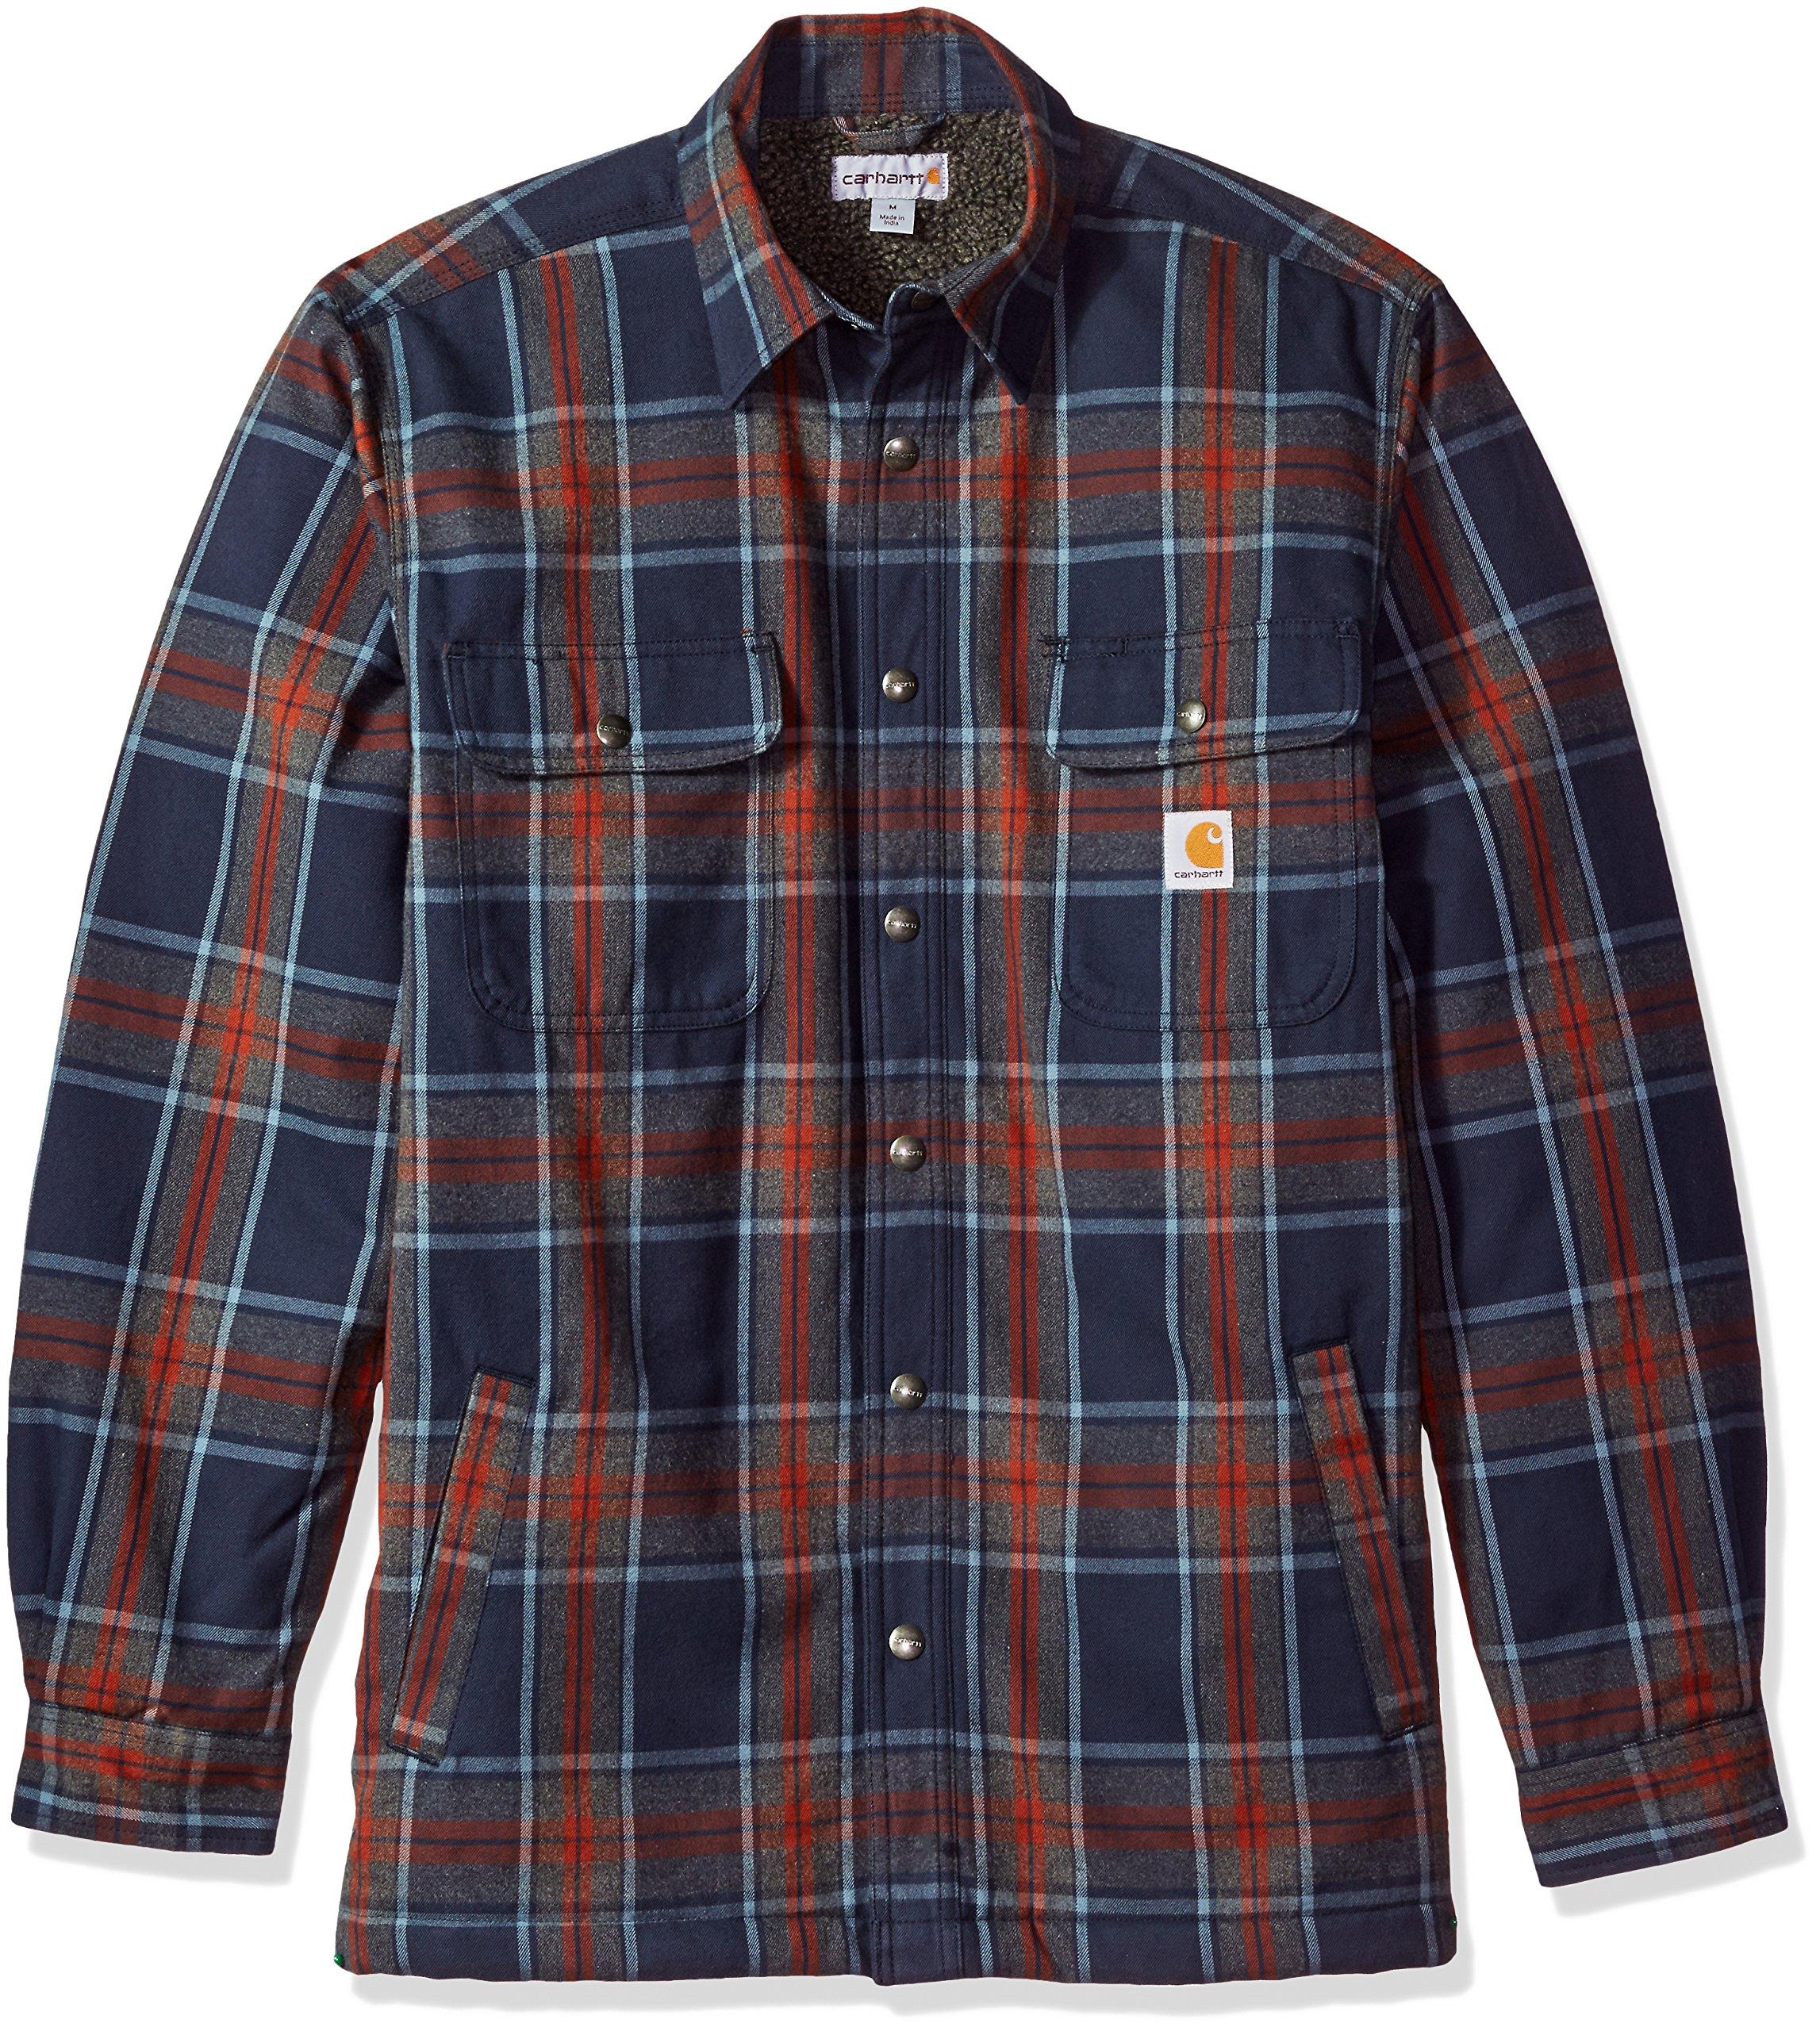 Carhartt Men's Hubbard Sherpa Lined Shirt Jacket, Navy, Large